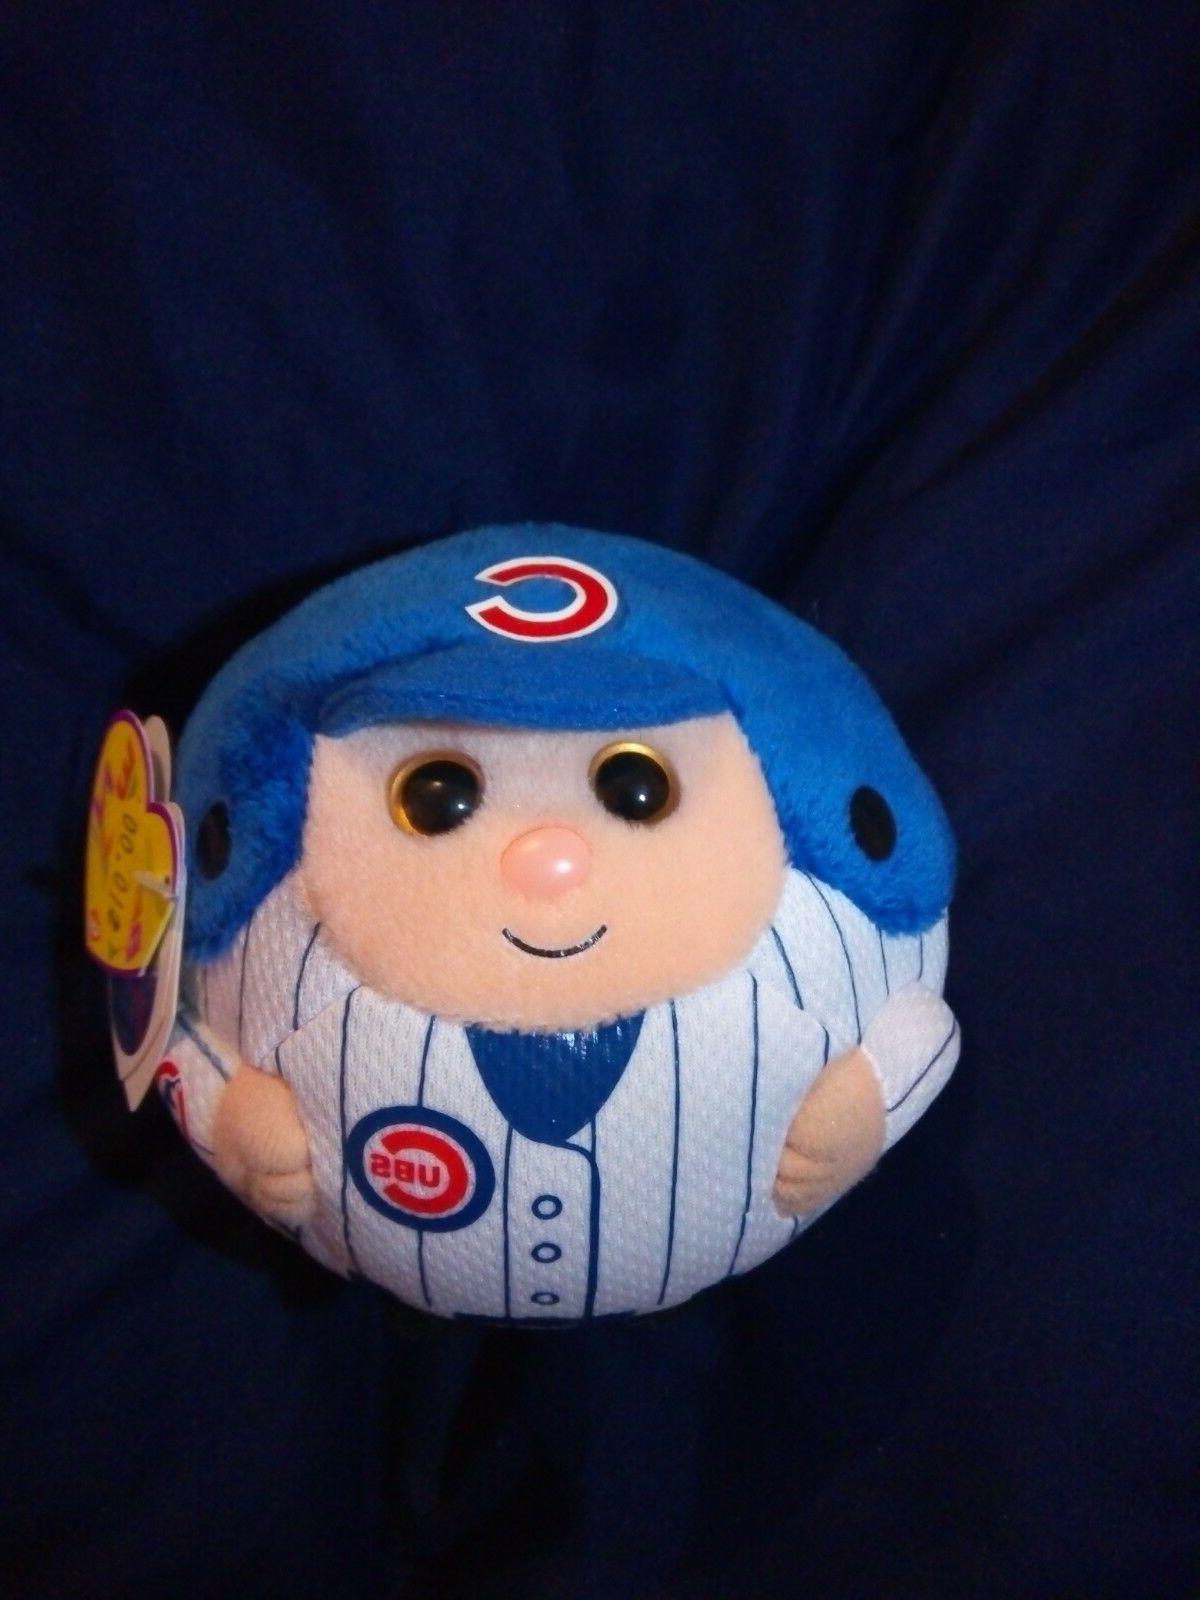 TY Beanie Ballz Cubs Plush MLB uniform